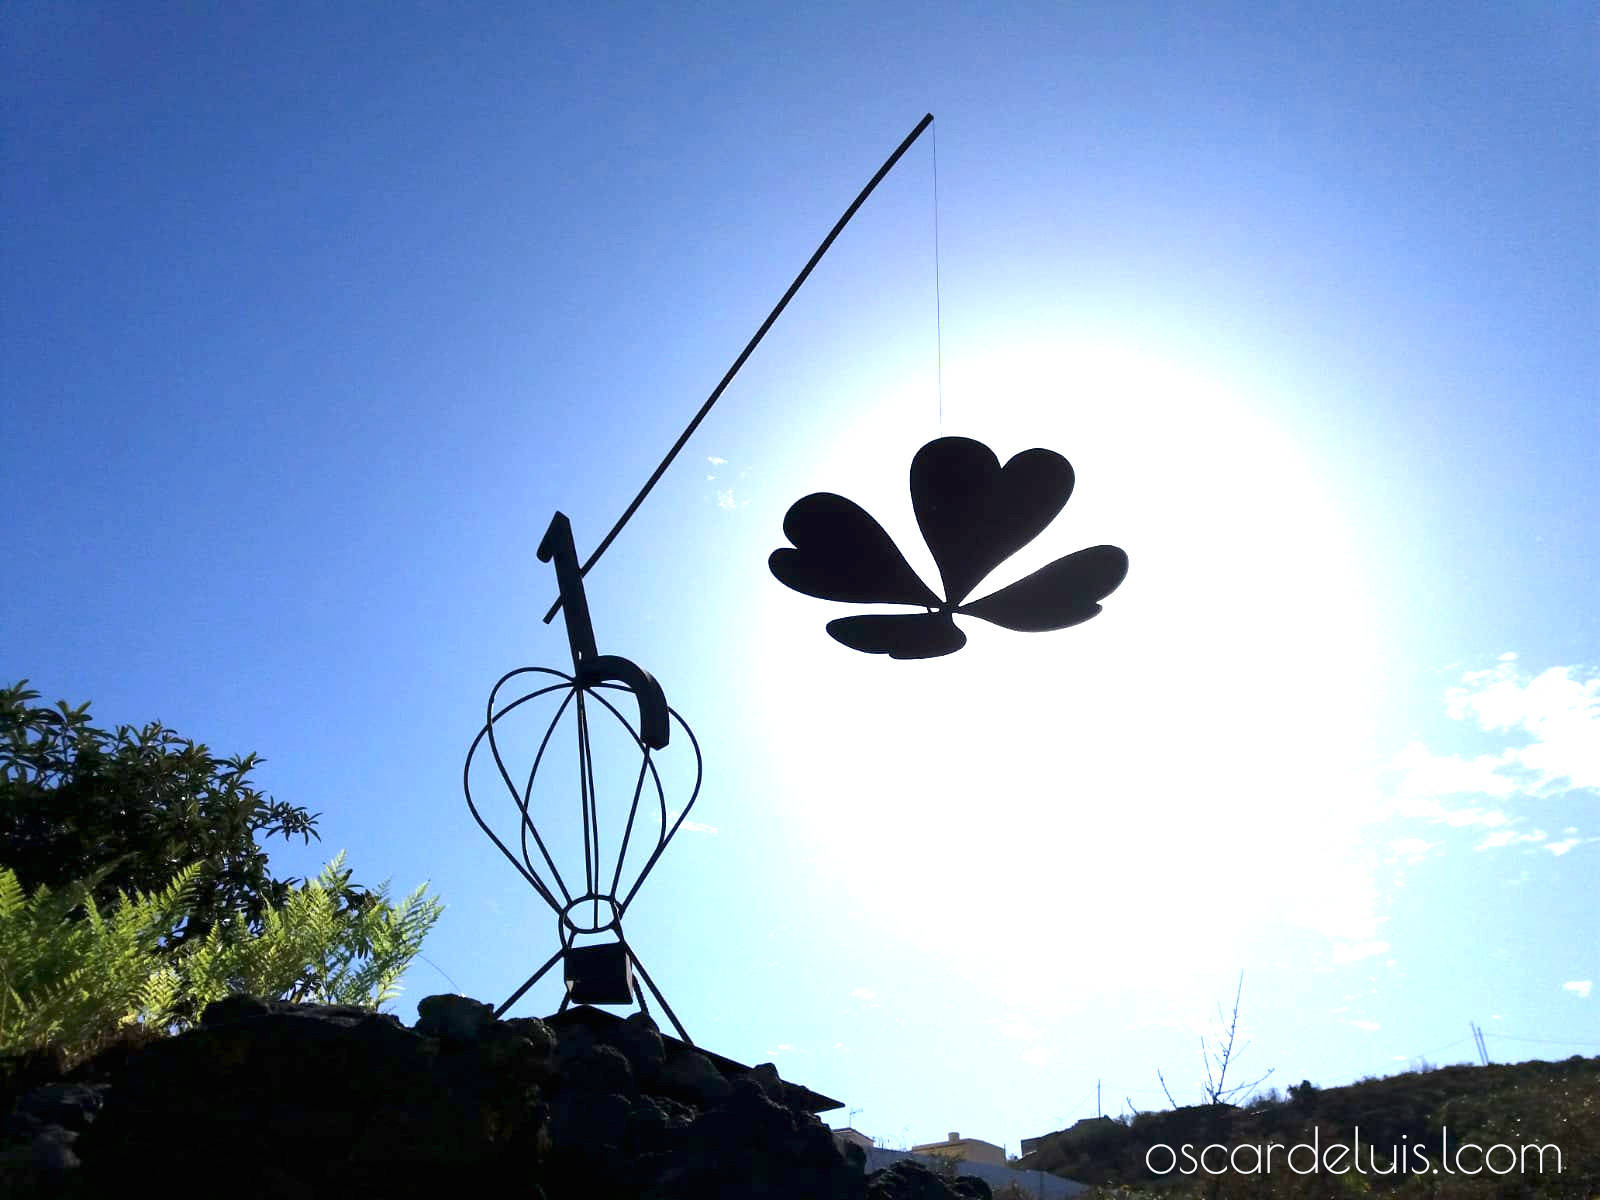 escultura-acero-corten-tenerife-el-destino